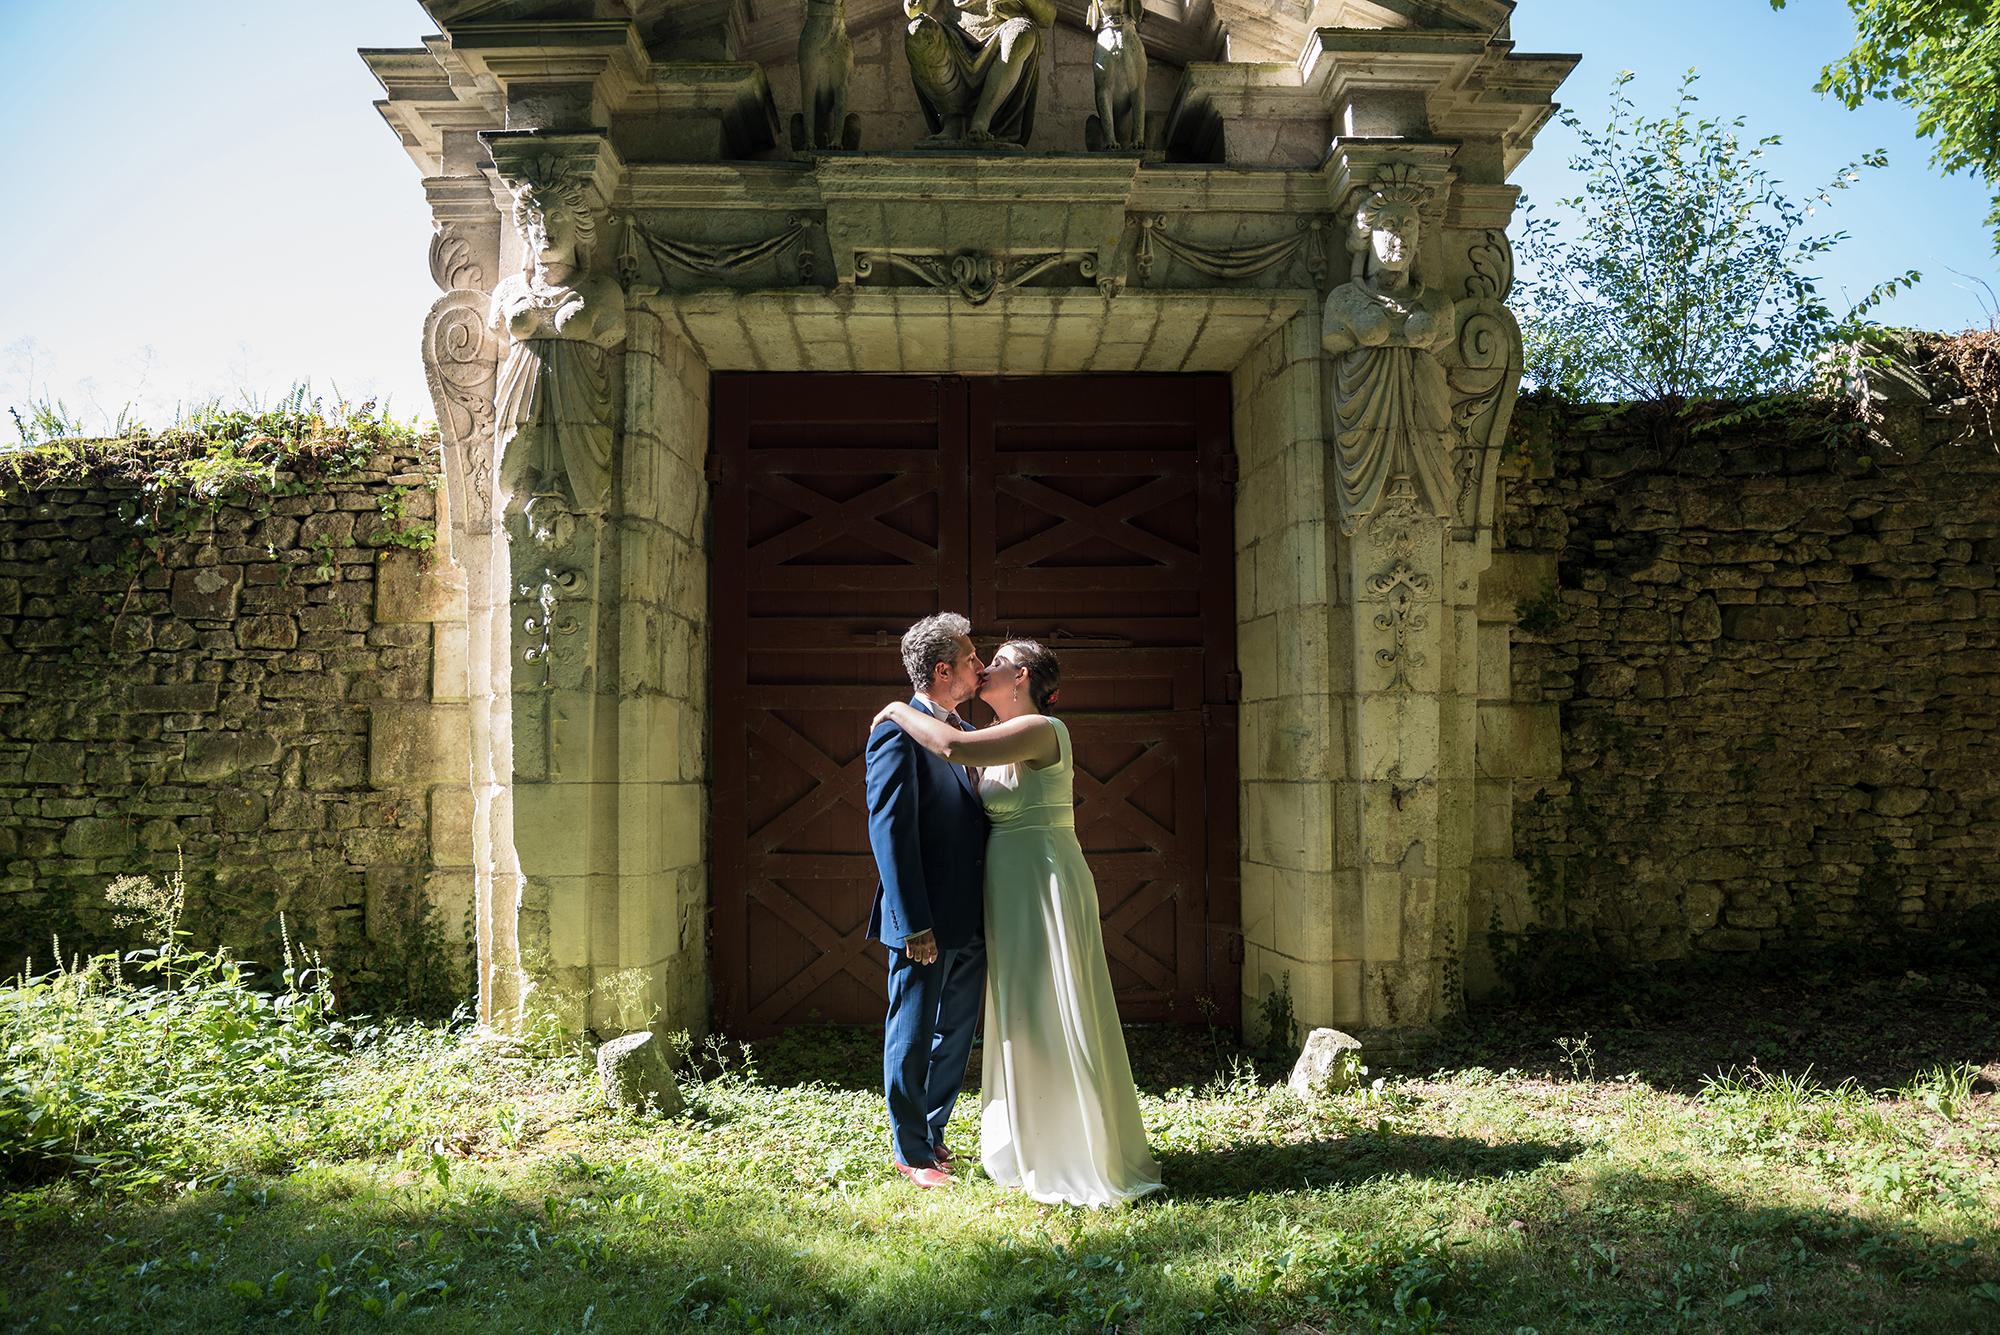 mariage-roxane-hennequin-photographe-aee05